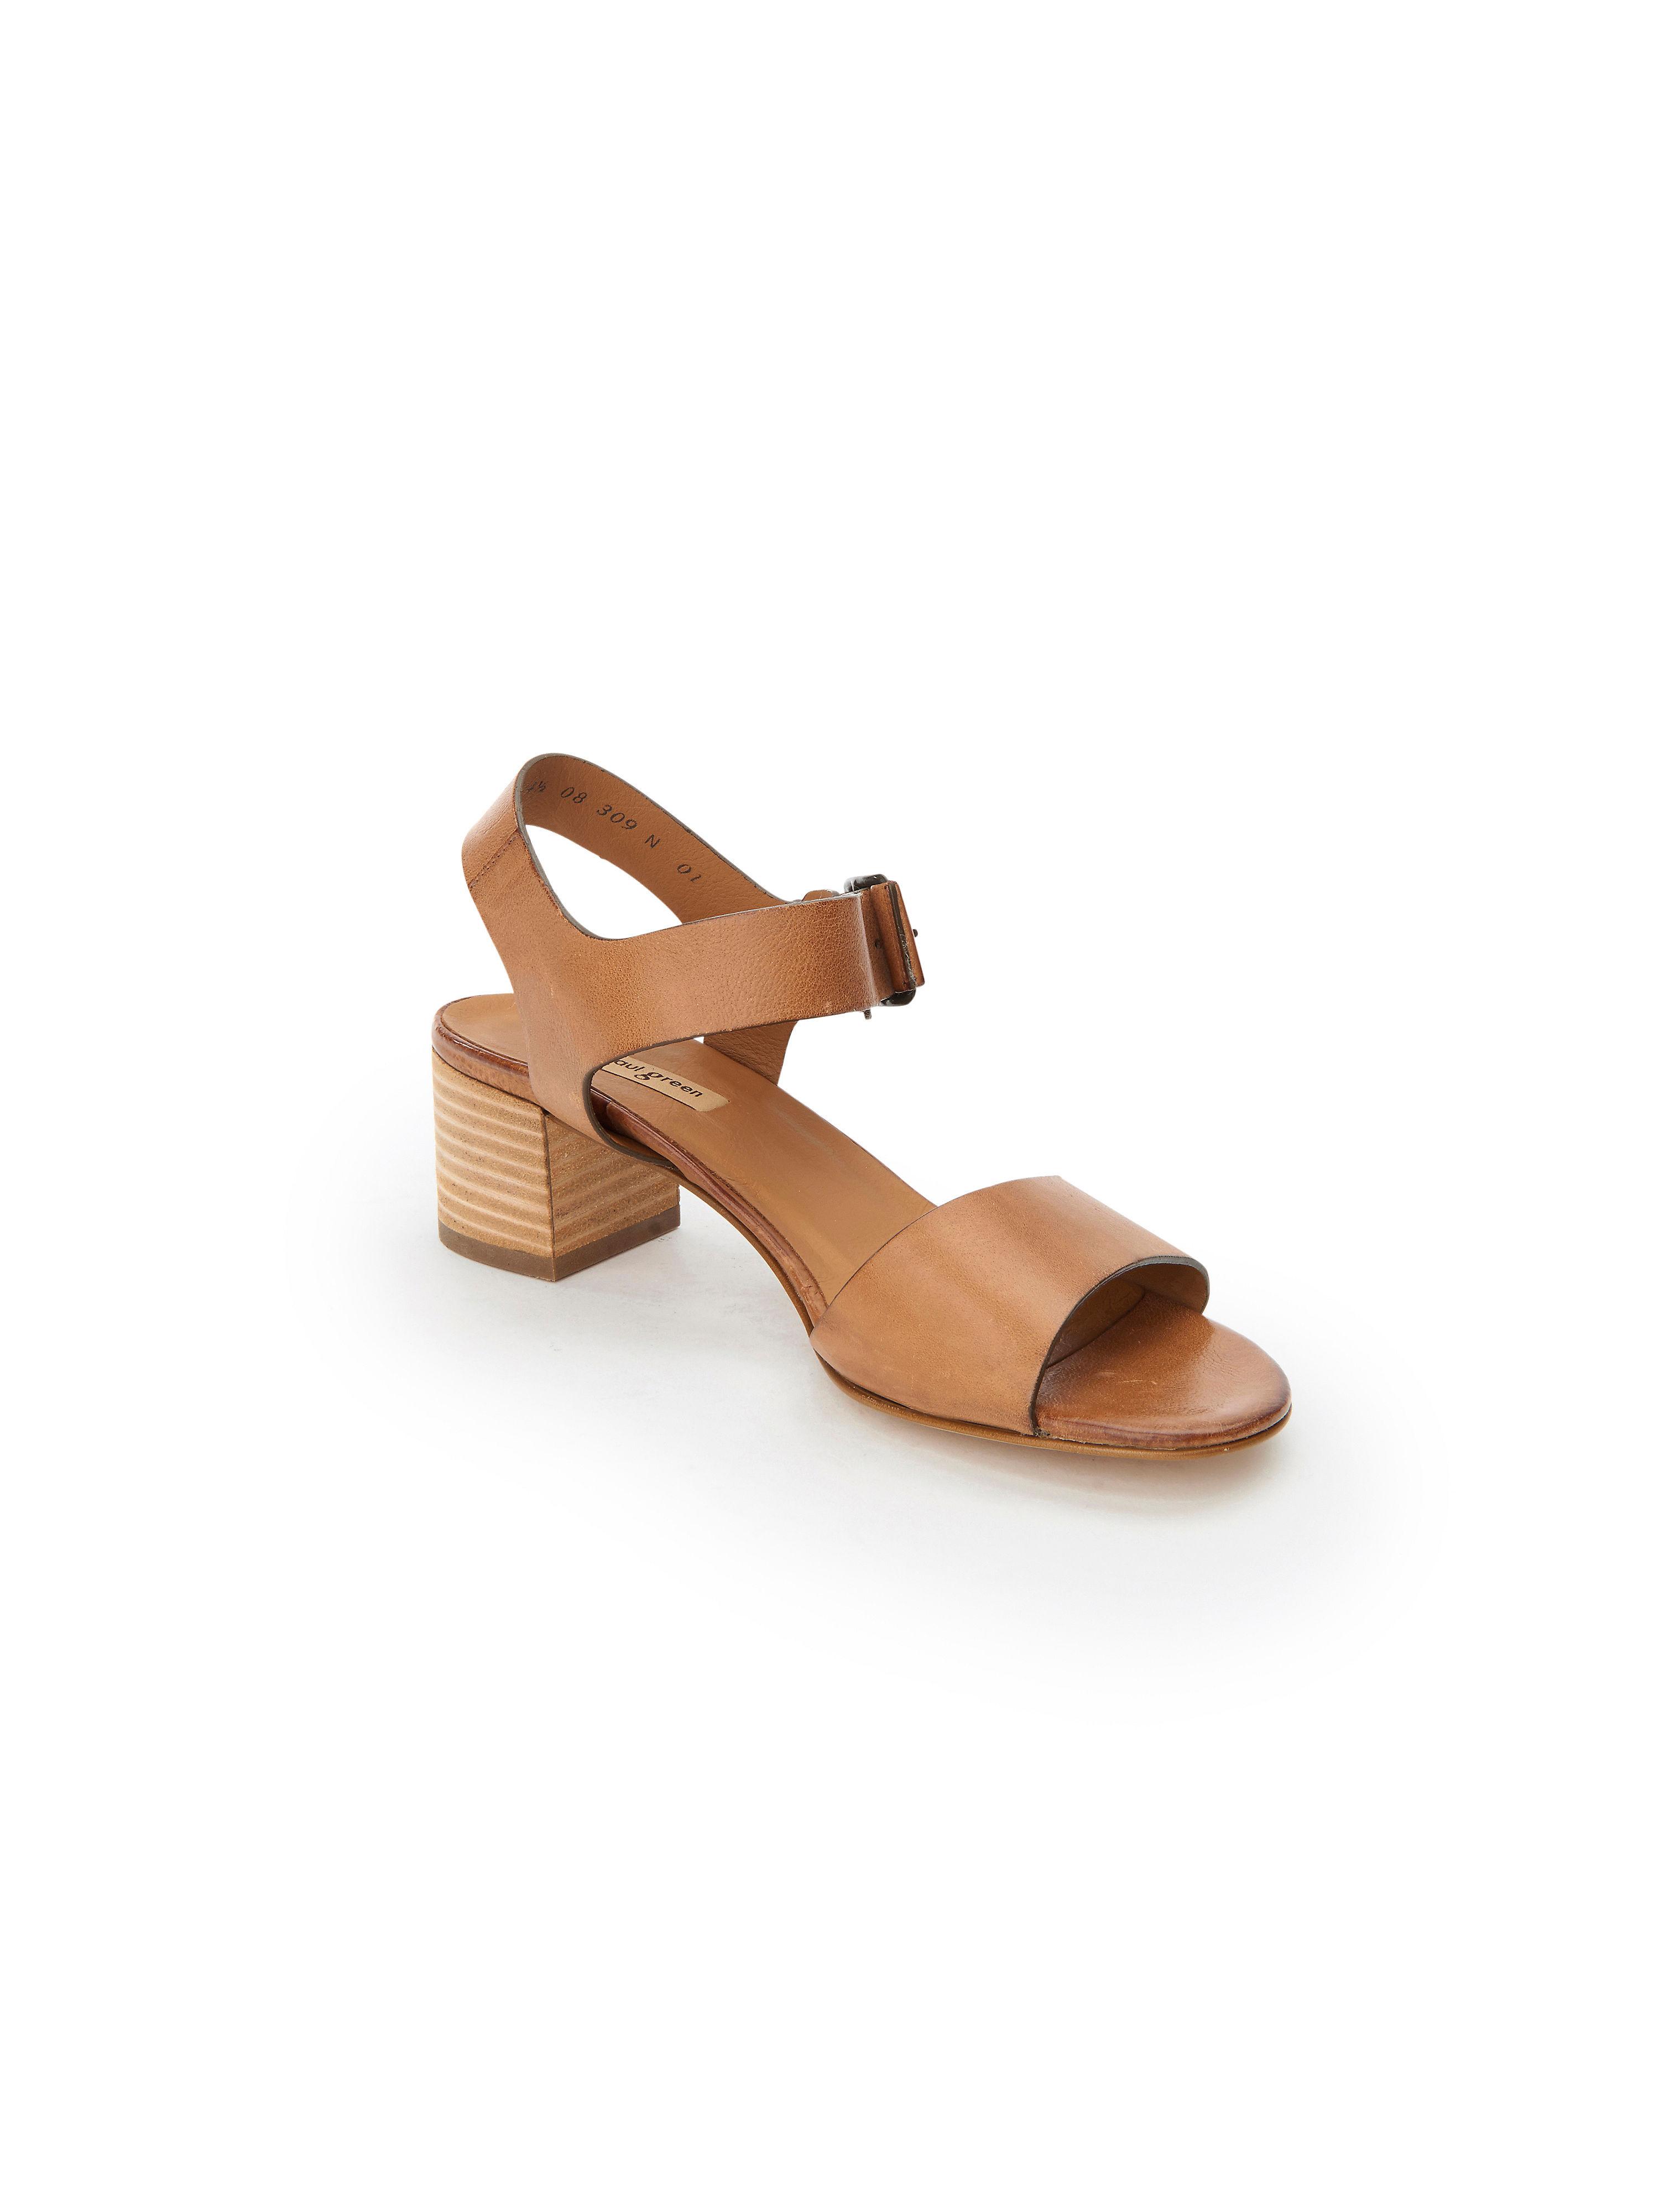 Paul Green - Sandale aus 100% Leder - Cognac Gute Qualität beliebte Schuhe